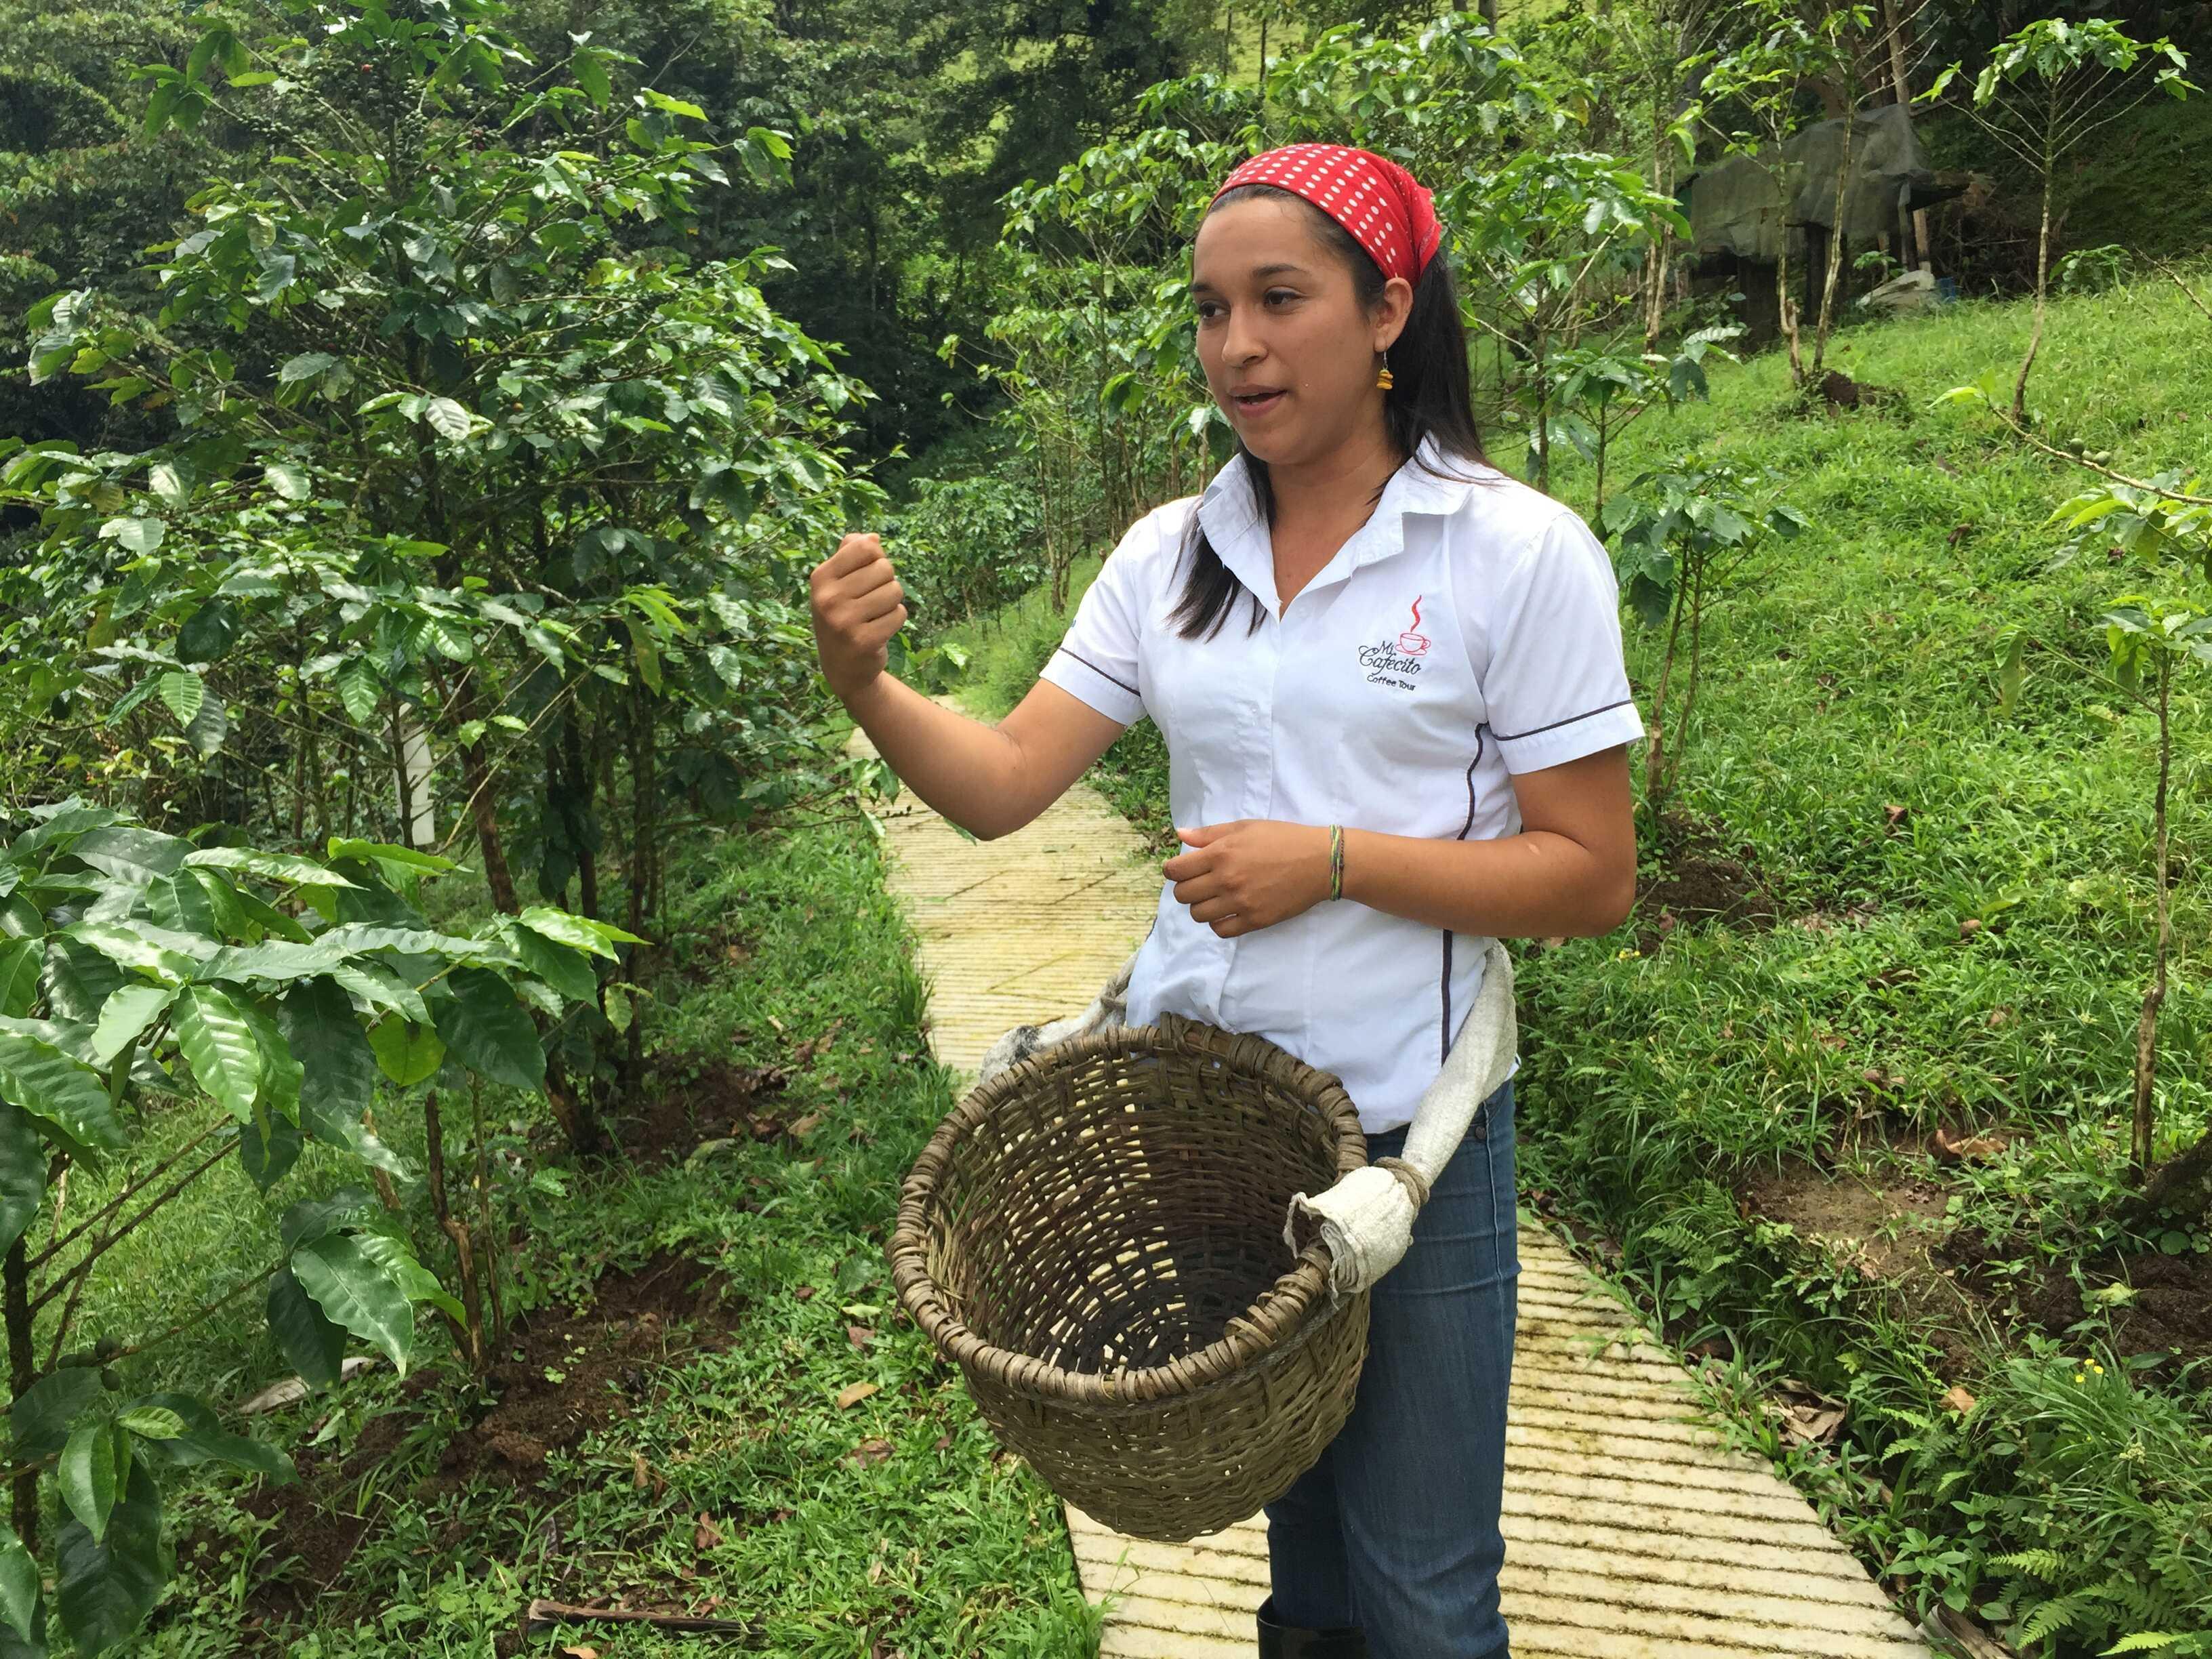 San Jose Day Tour: Doka Coffee Plantation, Poas Volcano & La Paz Waterfall